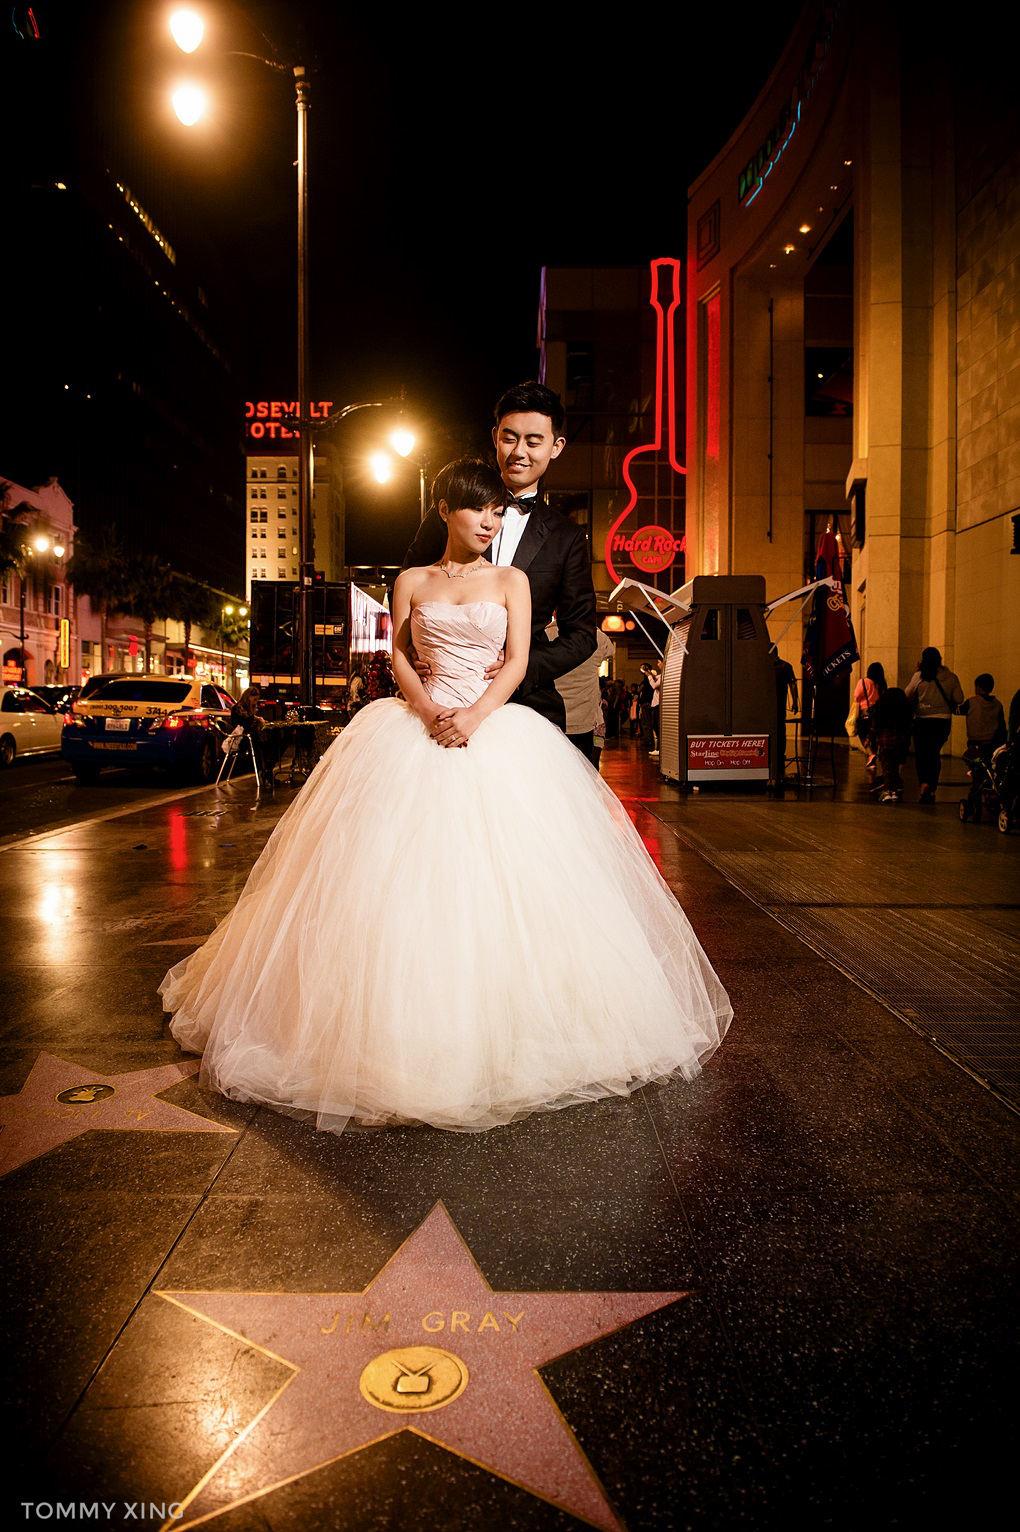 洛杉矶婚纱照 - Los Angeles Pre Wedding - Tommy Xing33.jpg